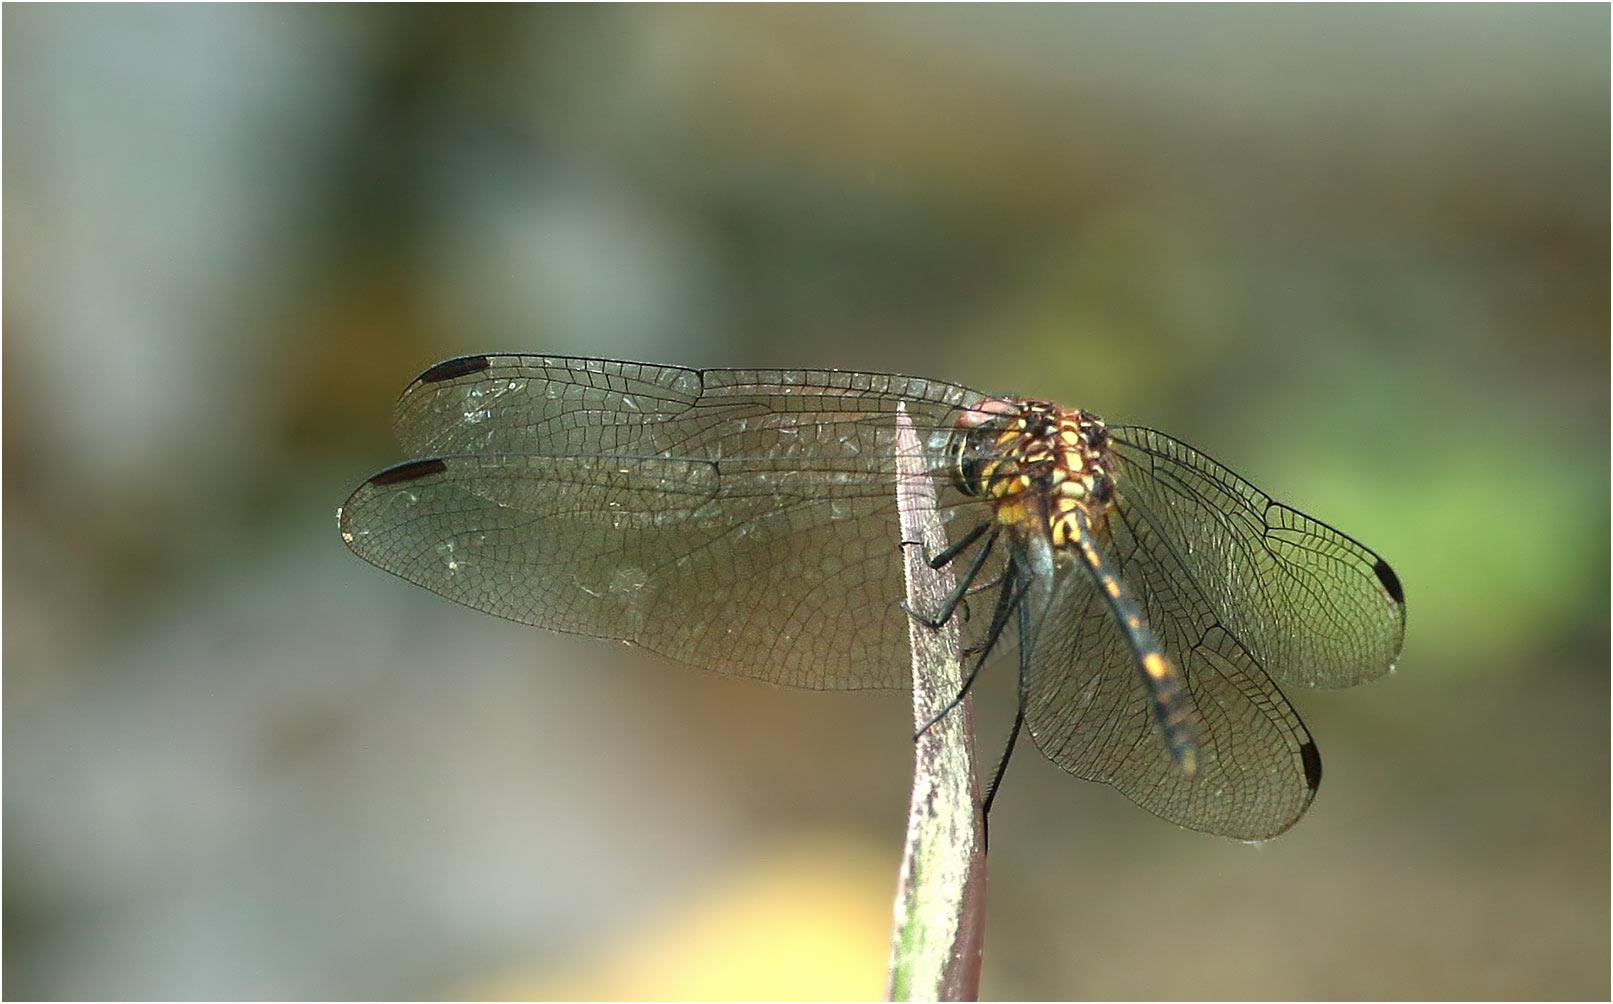 Dythemis sterilis femelle, Mexique, Arriaga (Chiapas), 26/10/2019